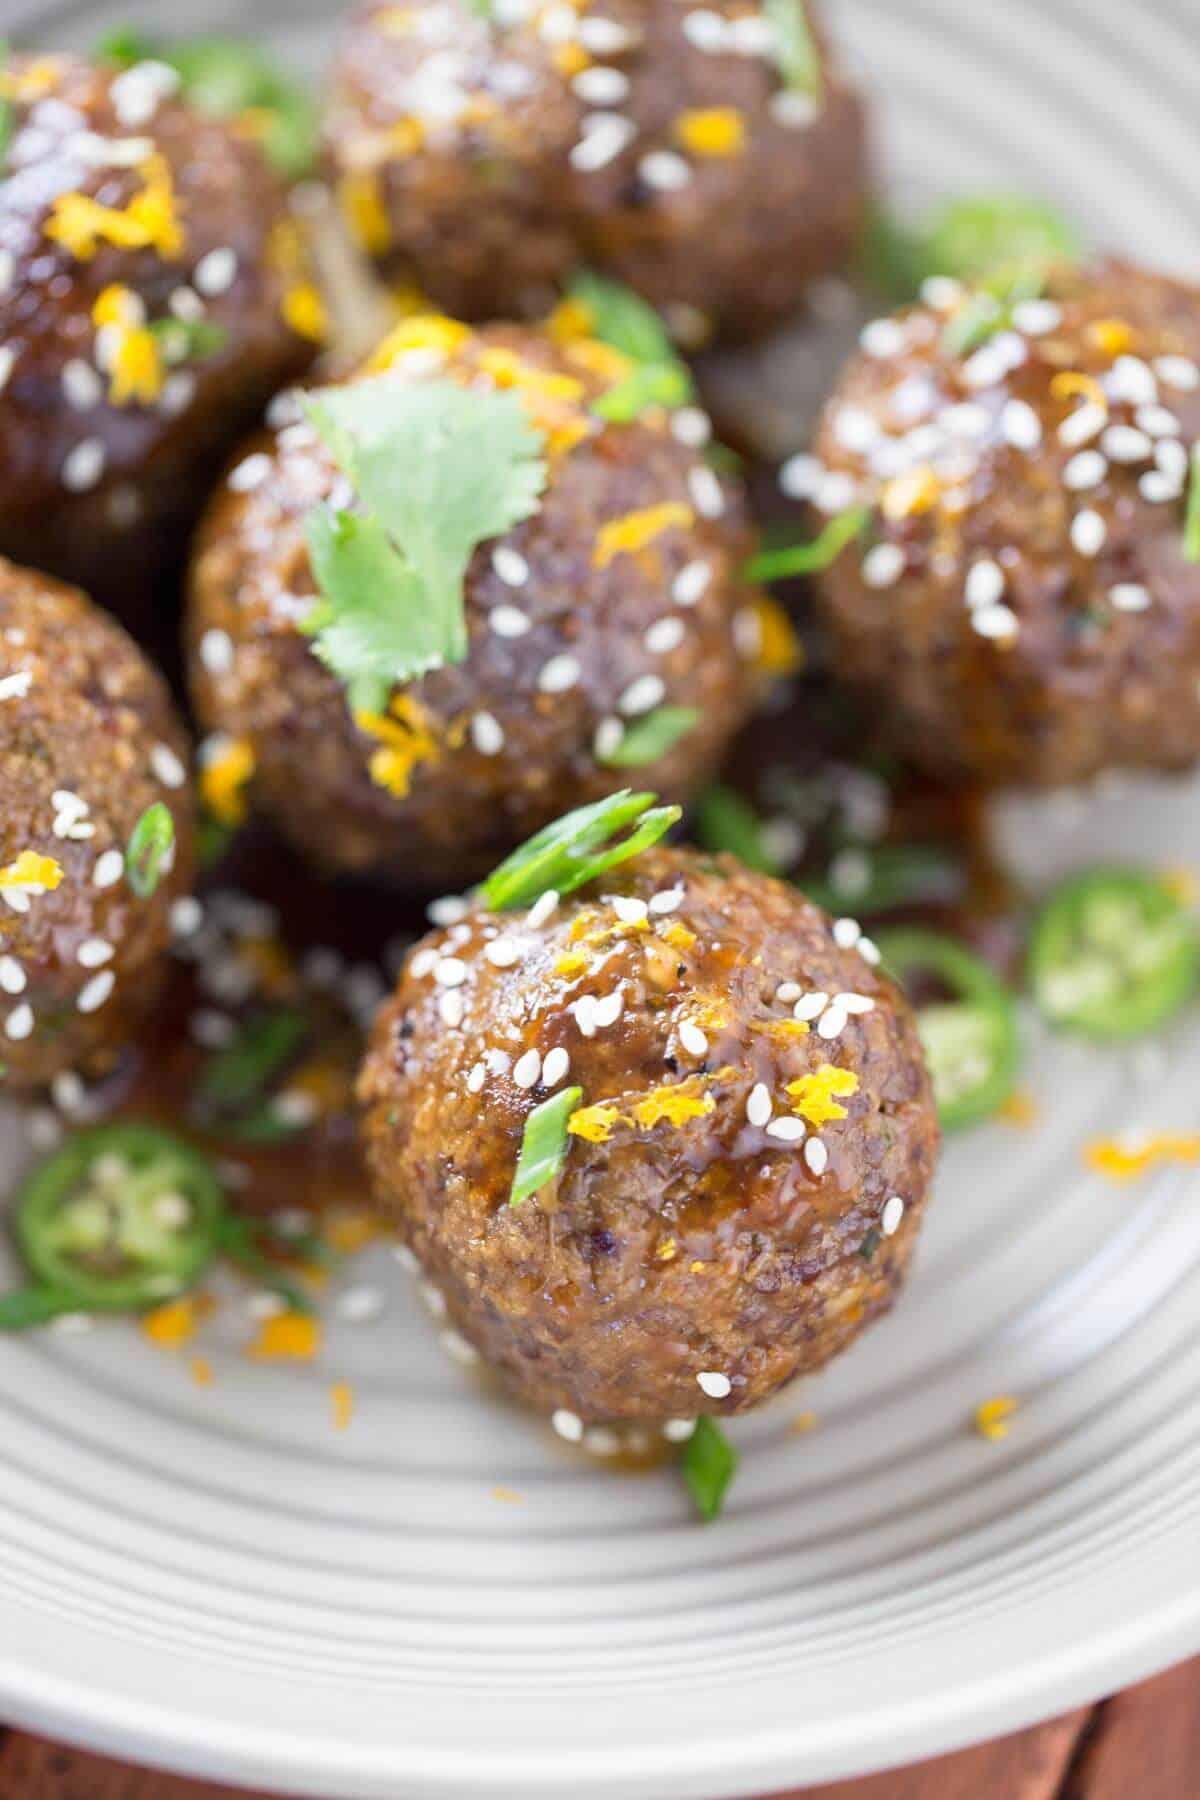 Asian Spiced Quinoa Meatballs with Orange Sauce | jessicagavin.com #healthyrecipe